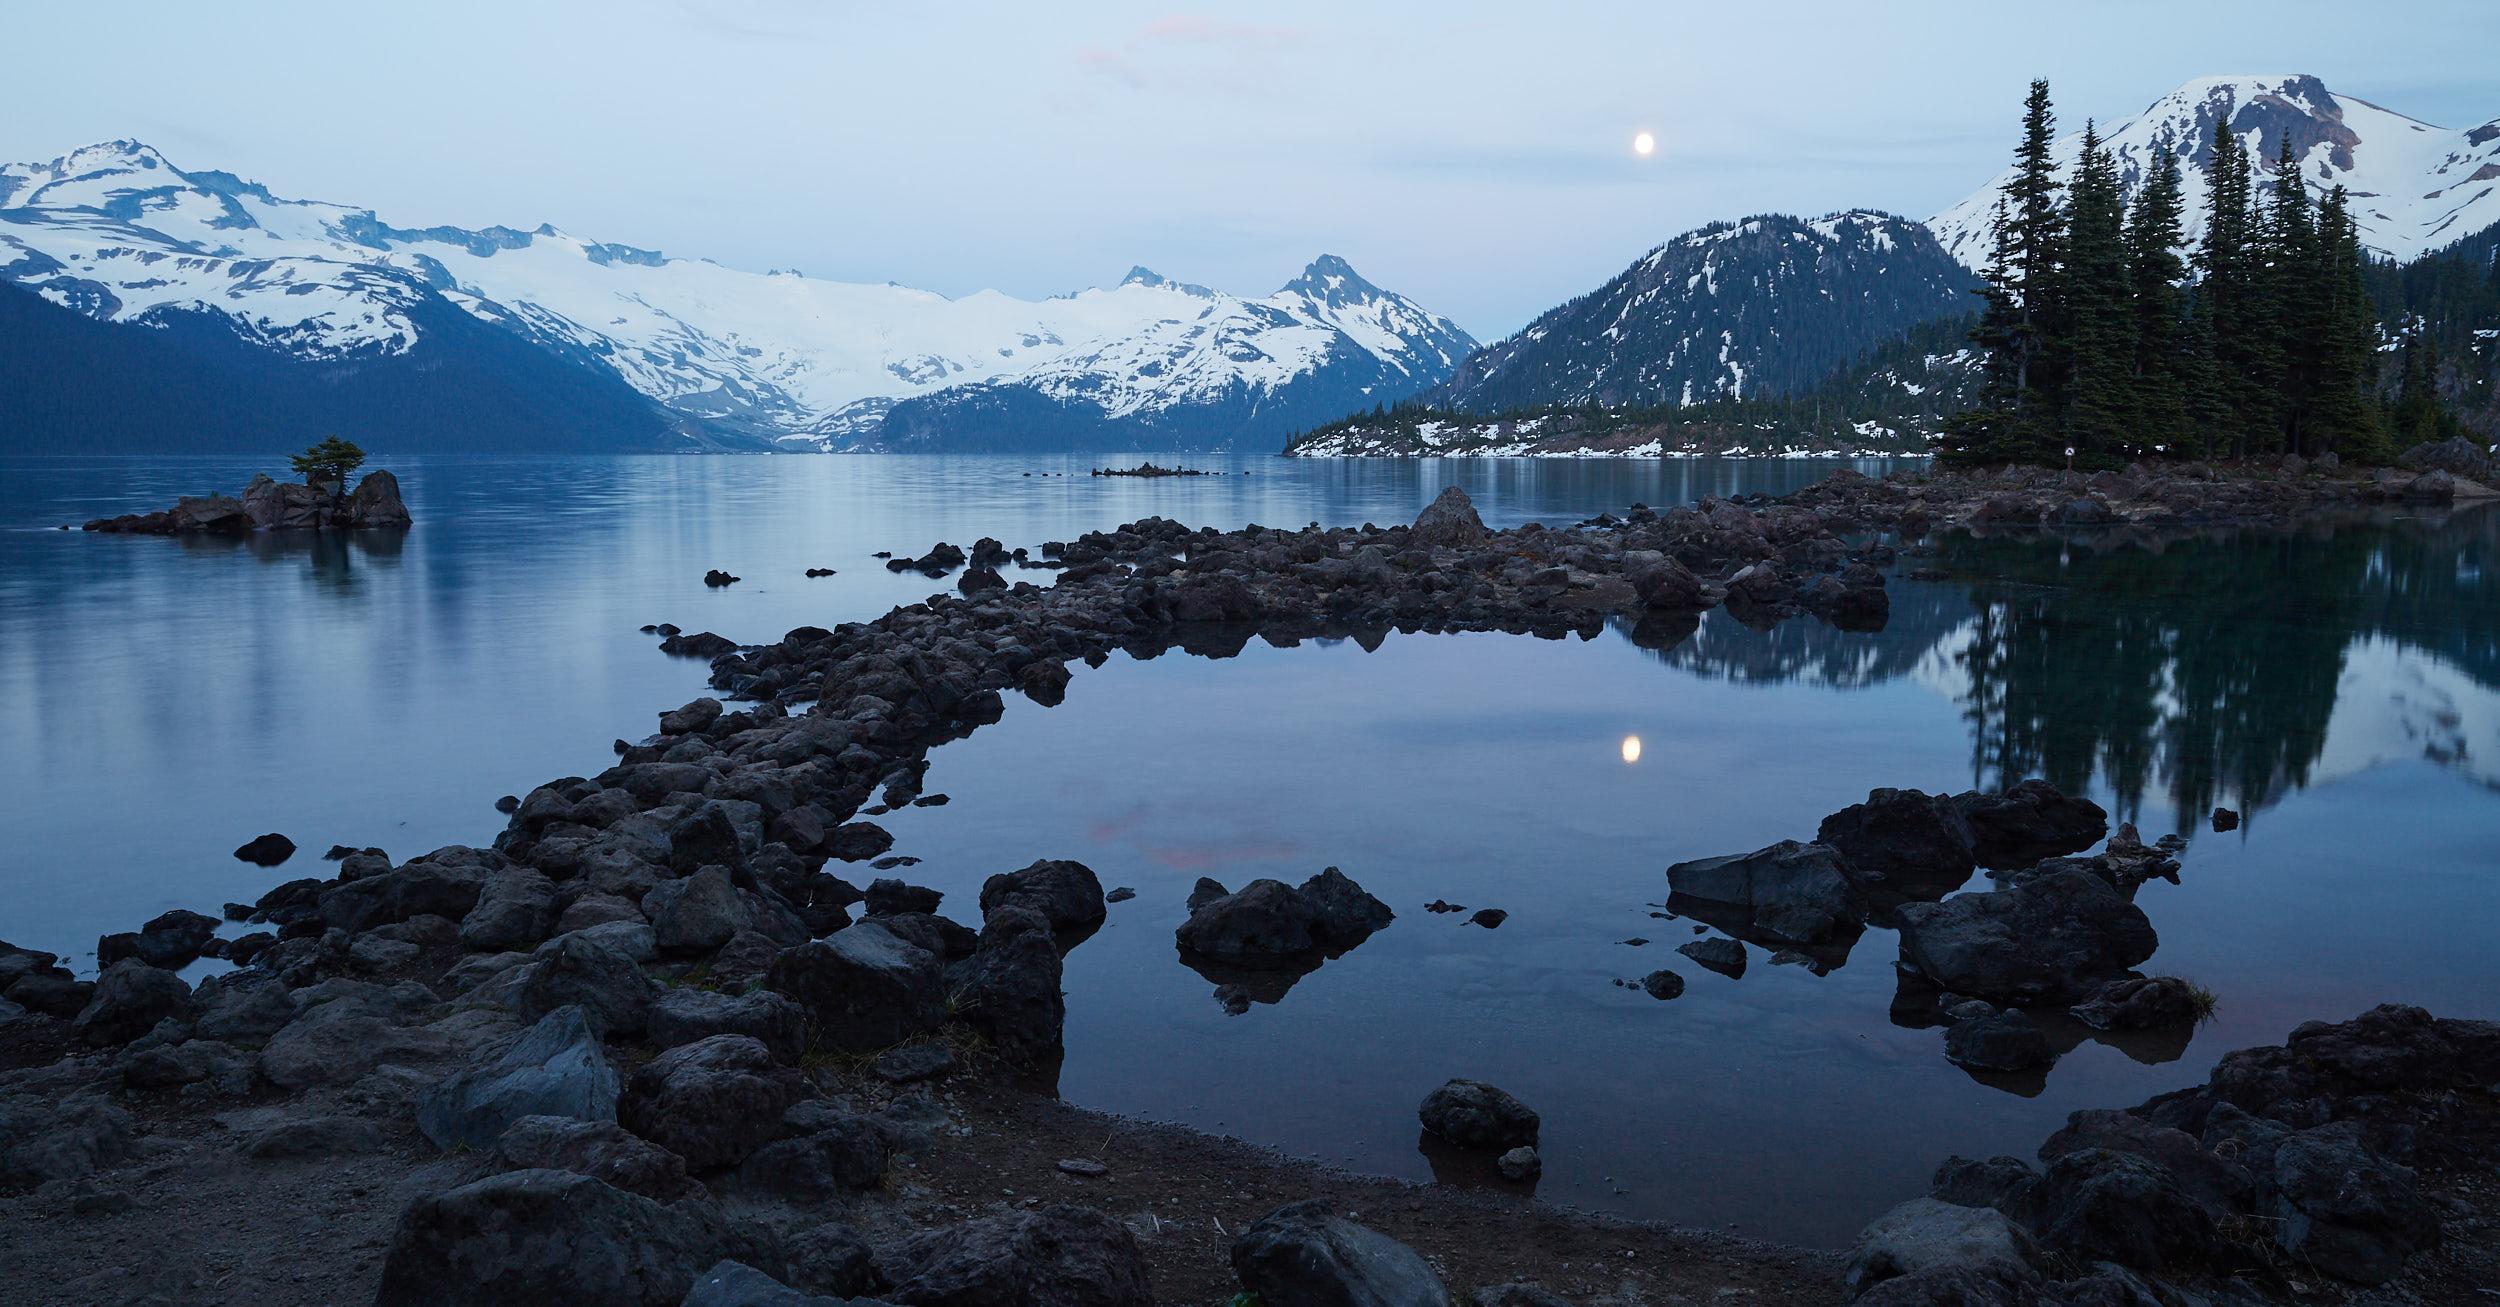 Camping at Garibaldi Lake 9.jpg